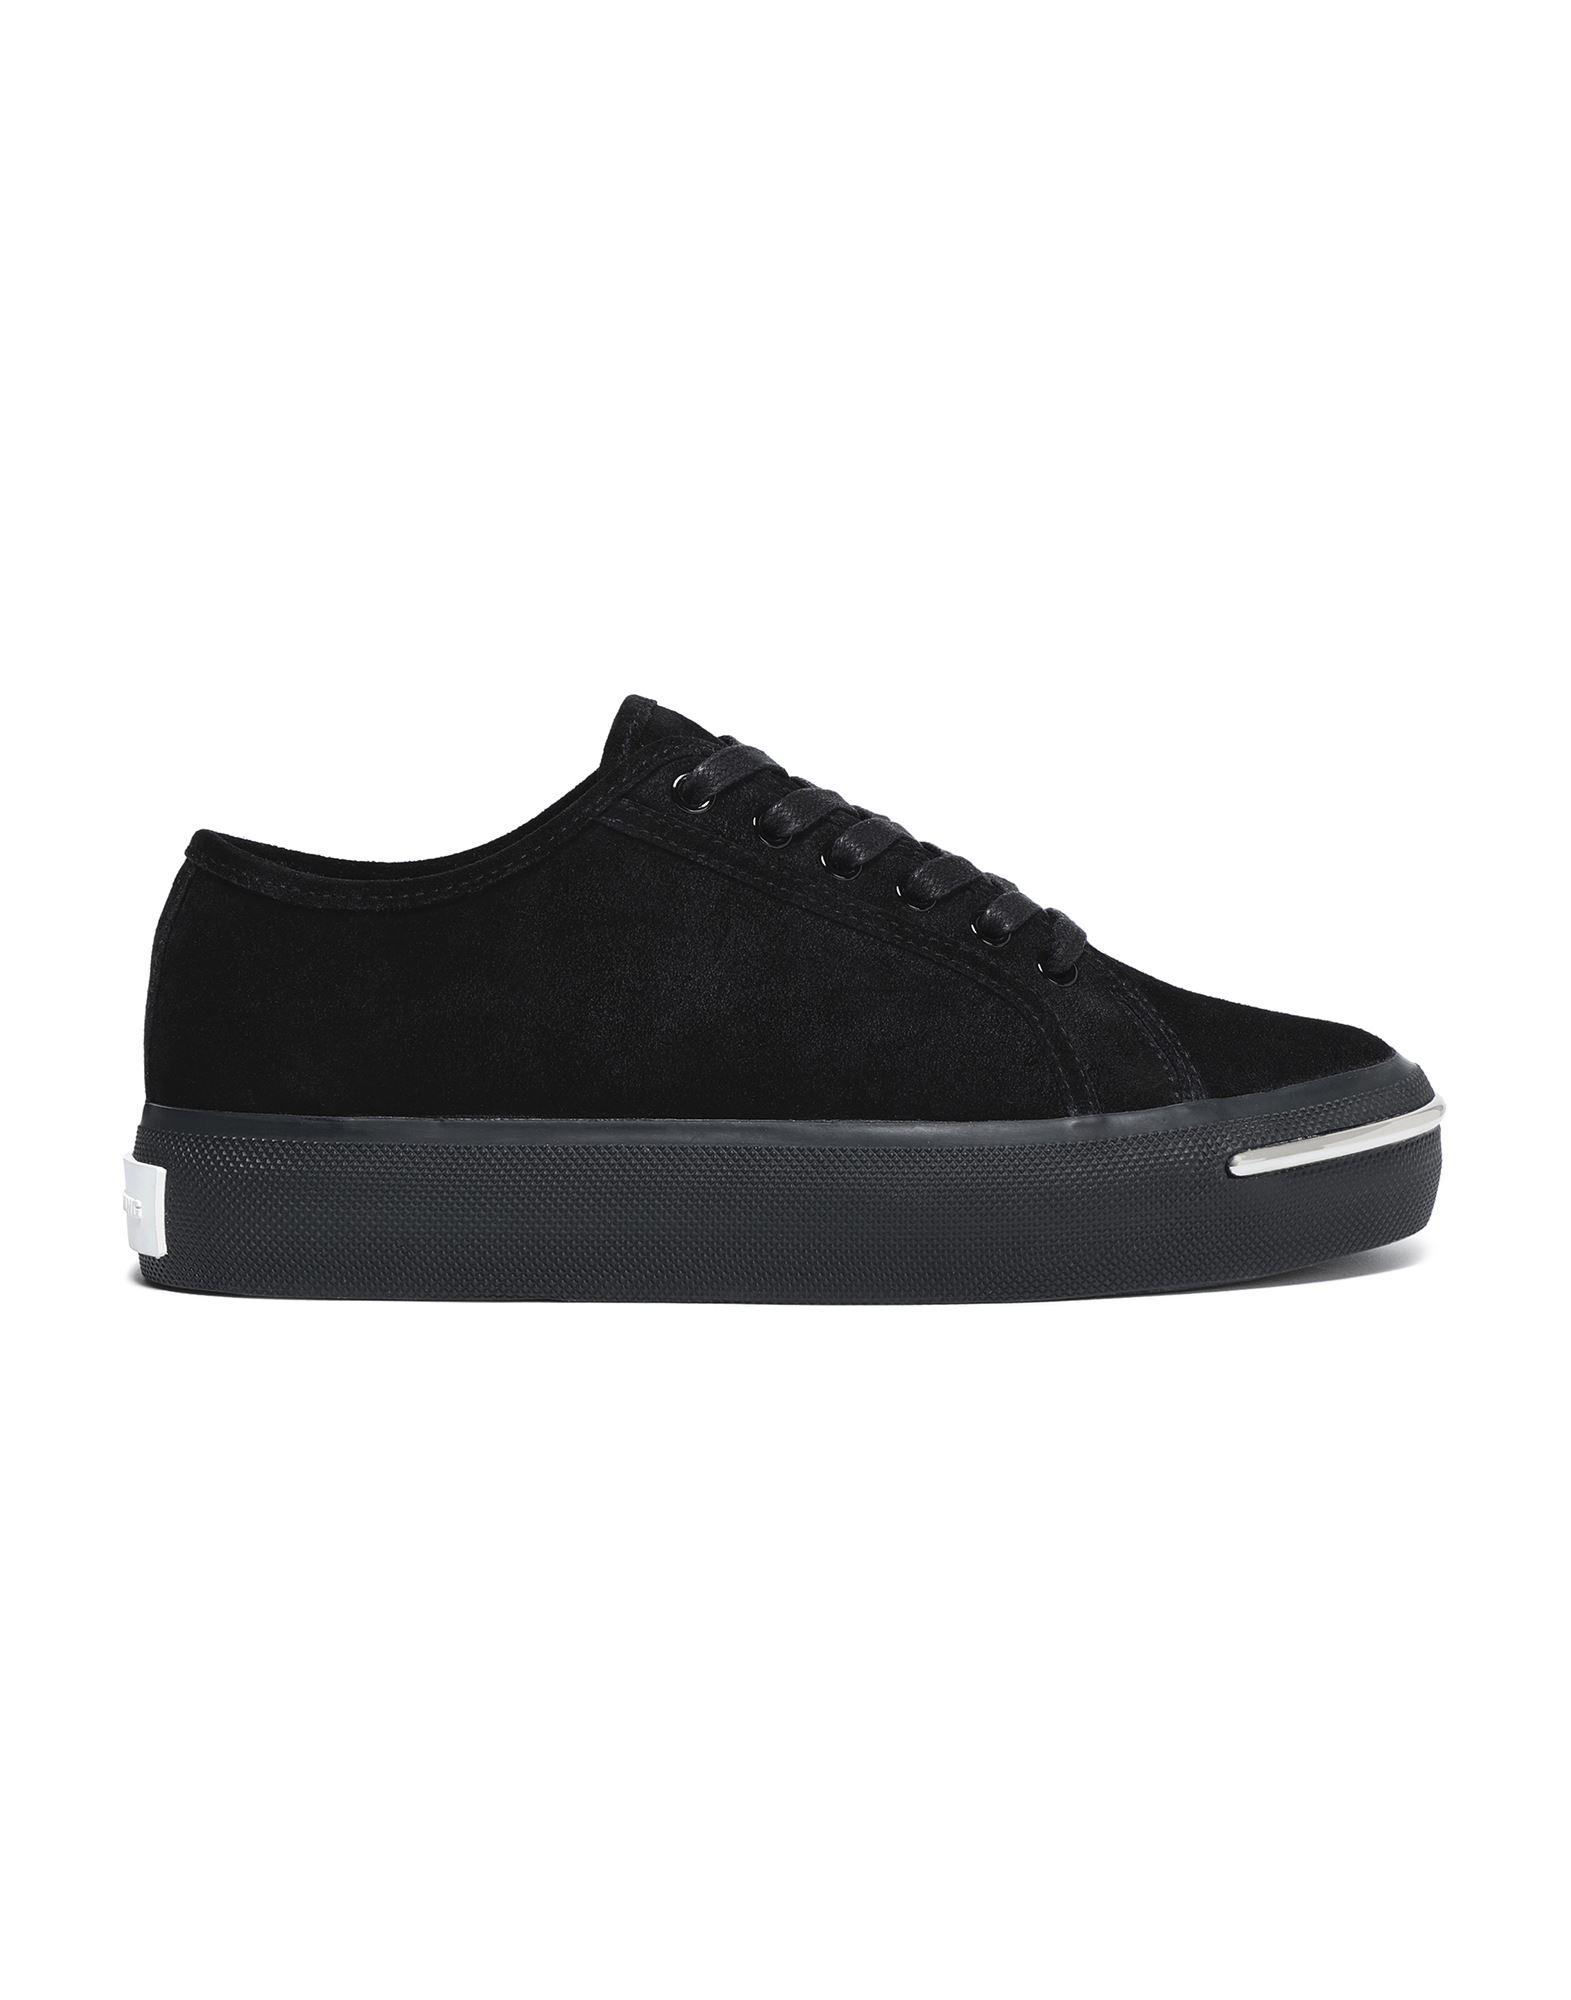 ALEXANDER WANG Low-tops & sneakers - Item 17003194